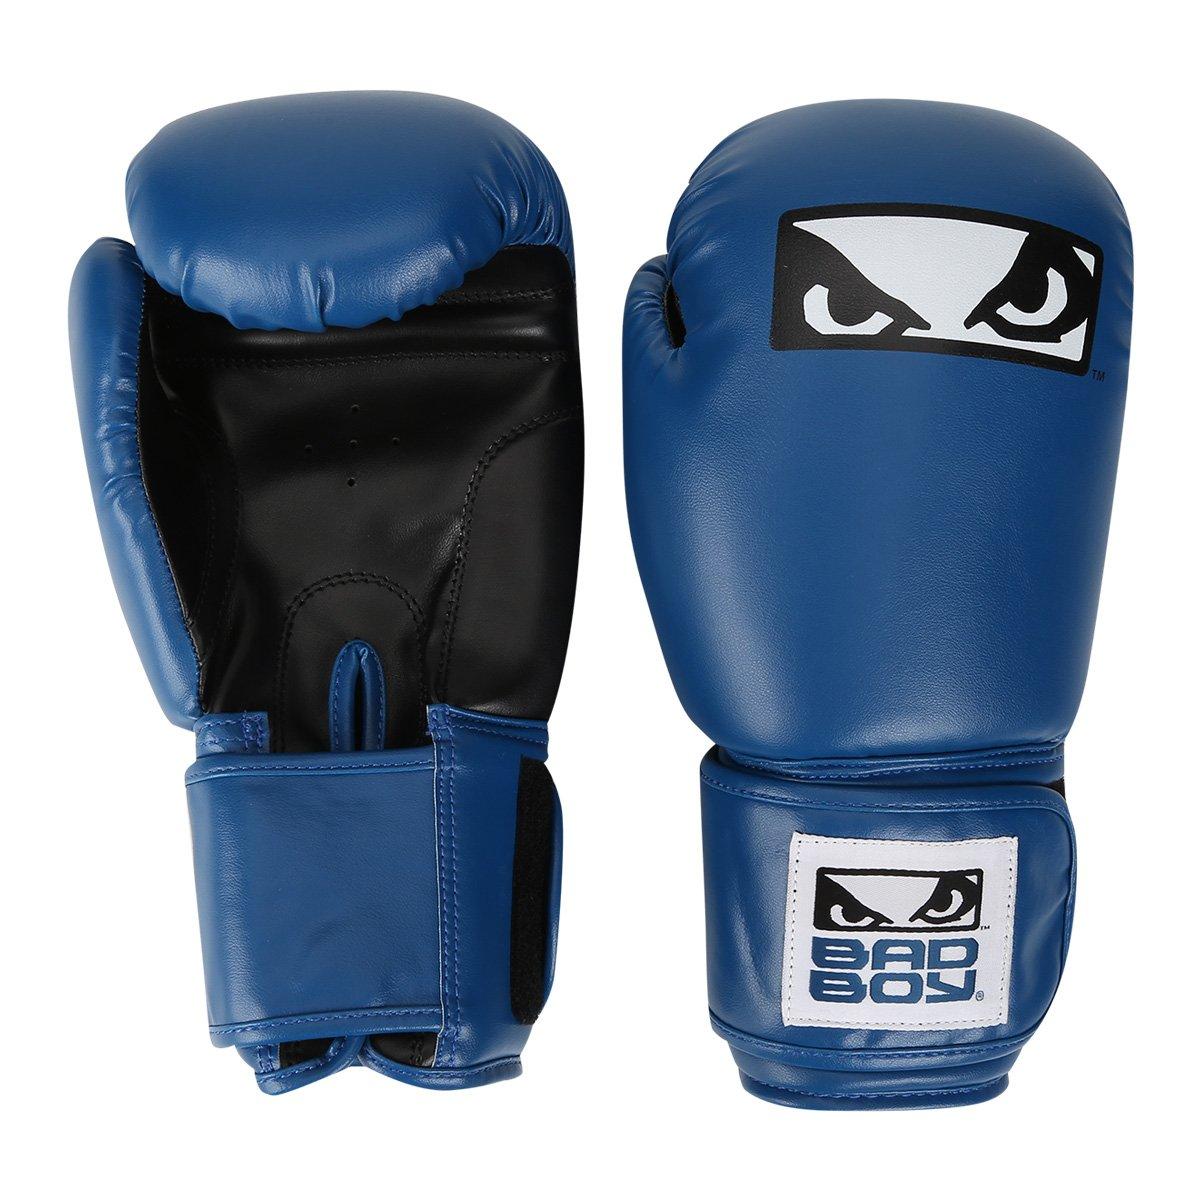 f2bf066cf Luva de Boxe Muay Thai Treino Bad Boy 16 OZ